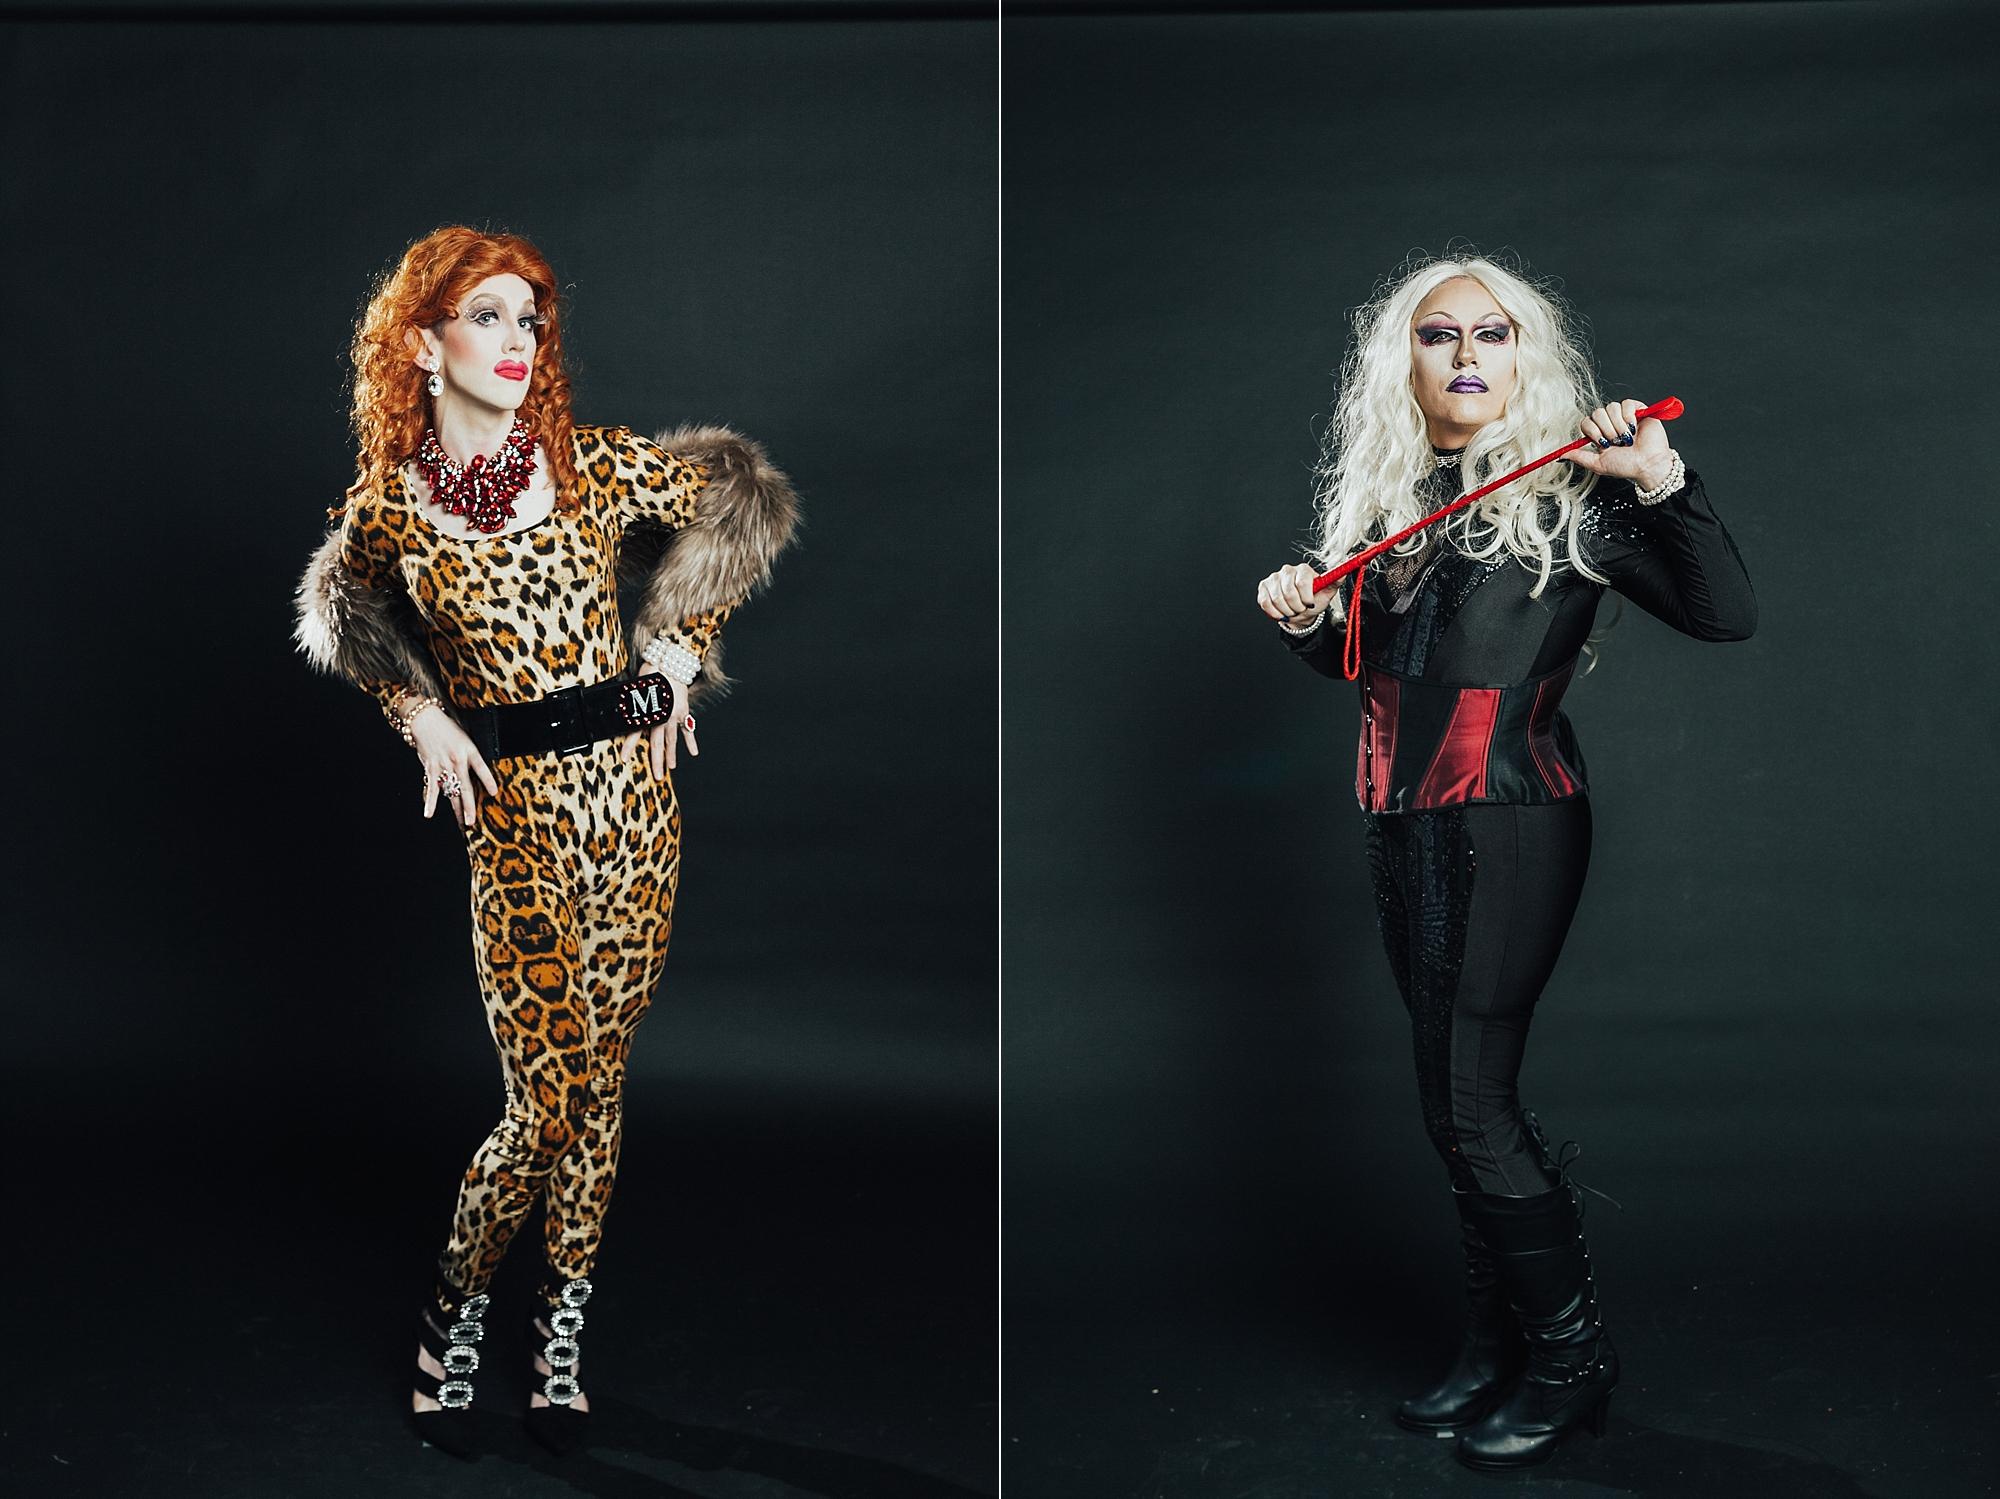 PGMC_Philadelphia_Gay_Mens_Chorus_Joe_Mac_Creative_LGBT_Photography_Voyeur_Gay_Philadelphia_0024.jpg